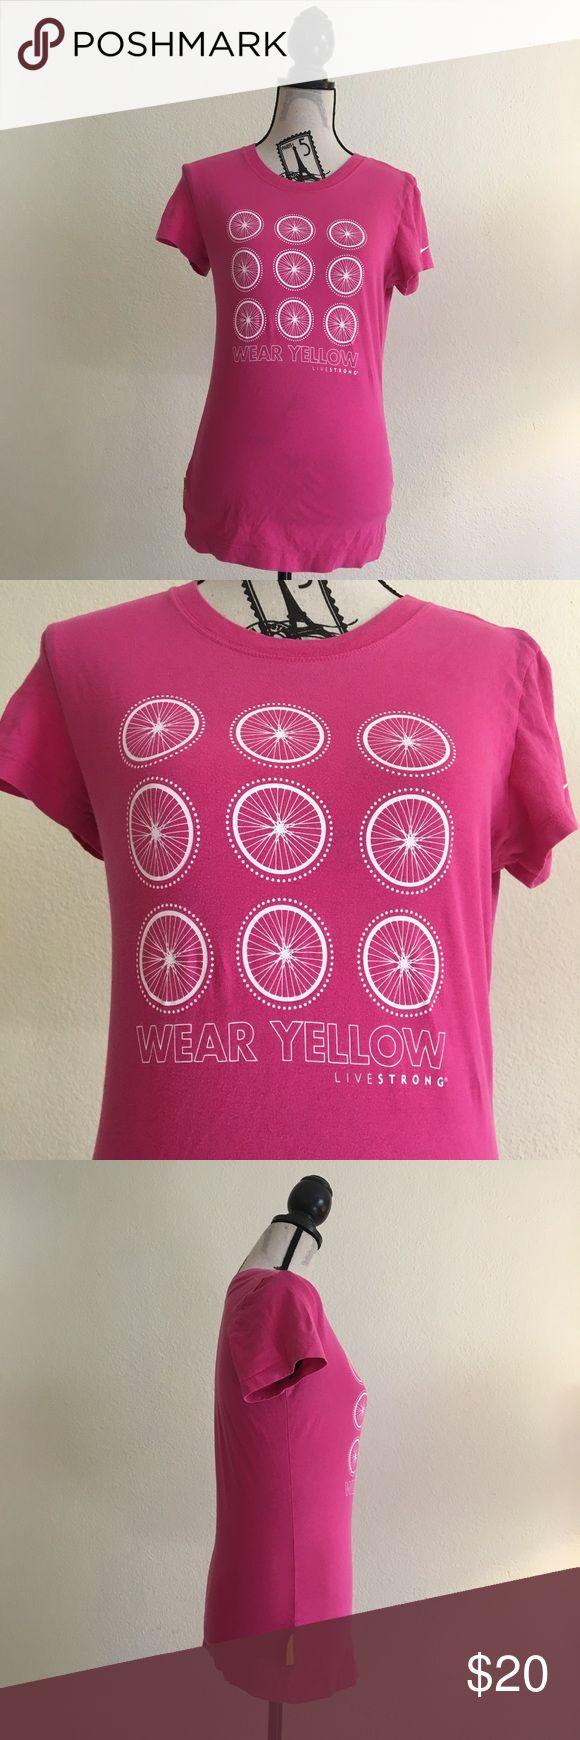 "Nike livestrong pink T Shirt Tee ""Wear yellow"" Nike livestrong pink T Shirt Tee ""Wear yellow"" short sleeve women's size medium Nike Tops Tees - Short Sleeve"